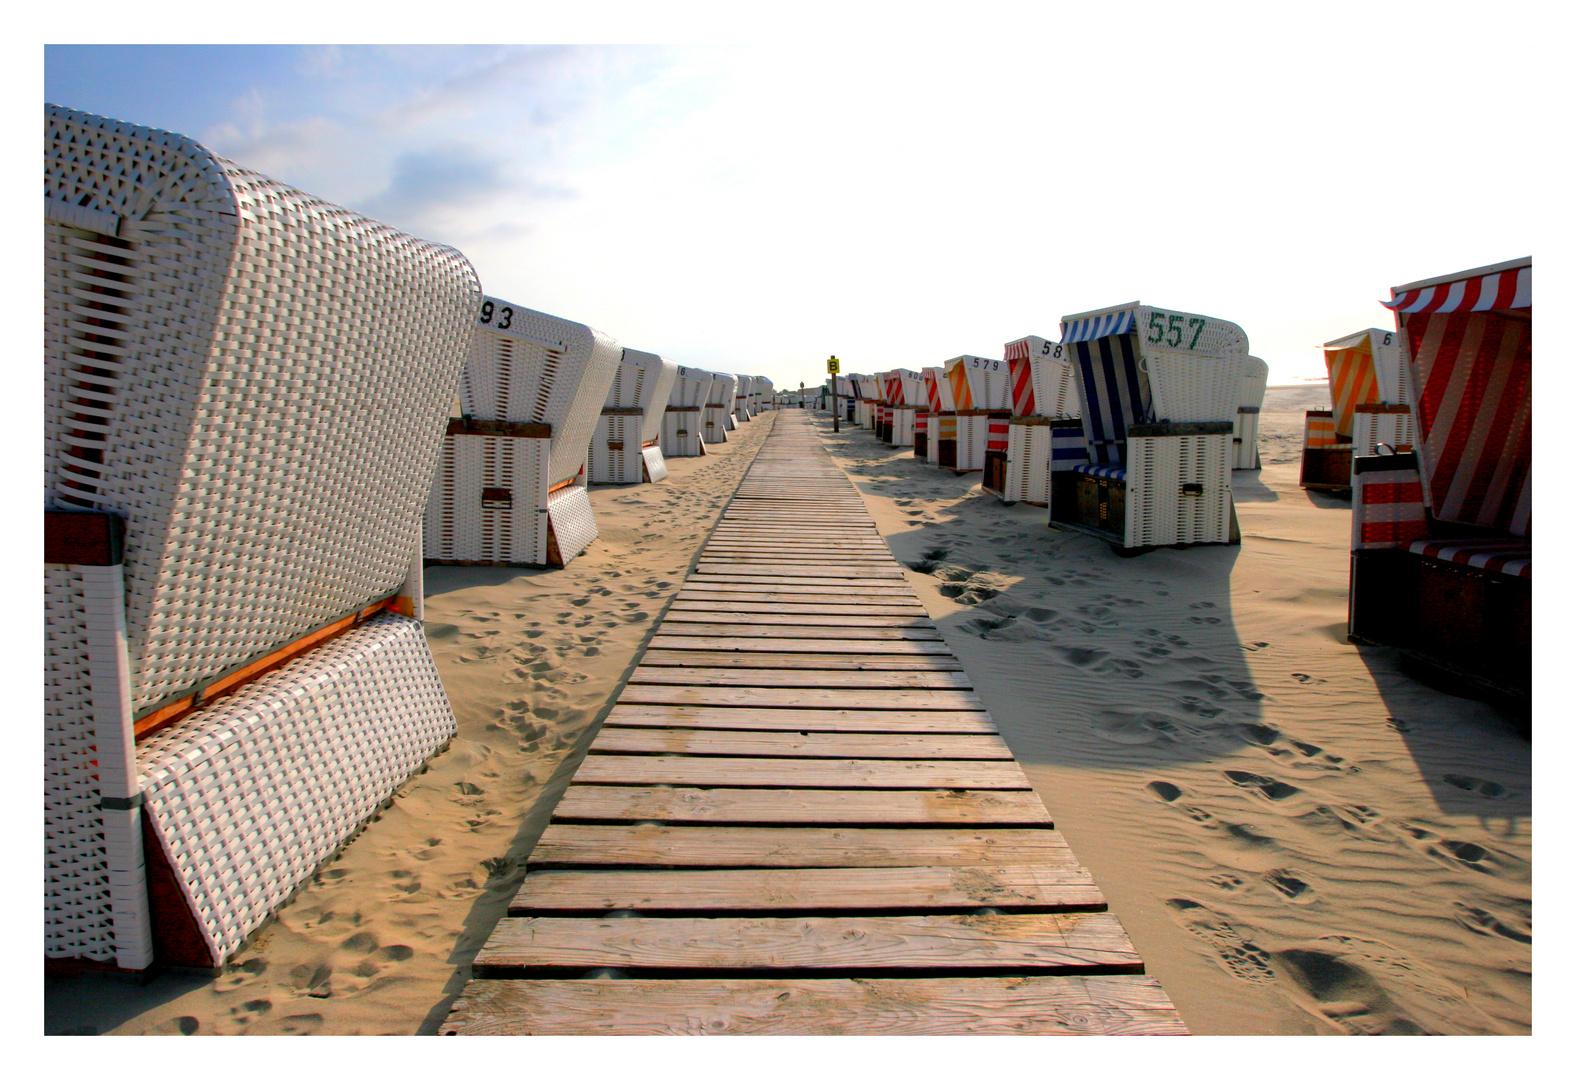 - Erde - Europa - Nordsee - Baltrum - Strandkorbparade